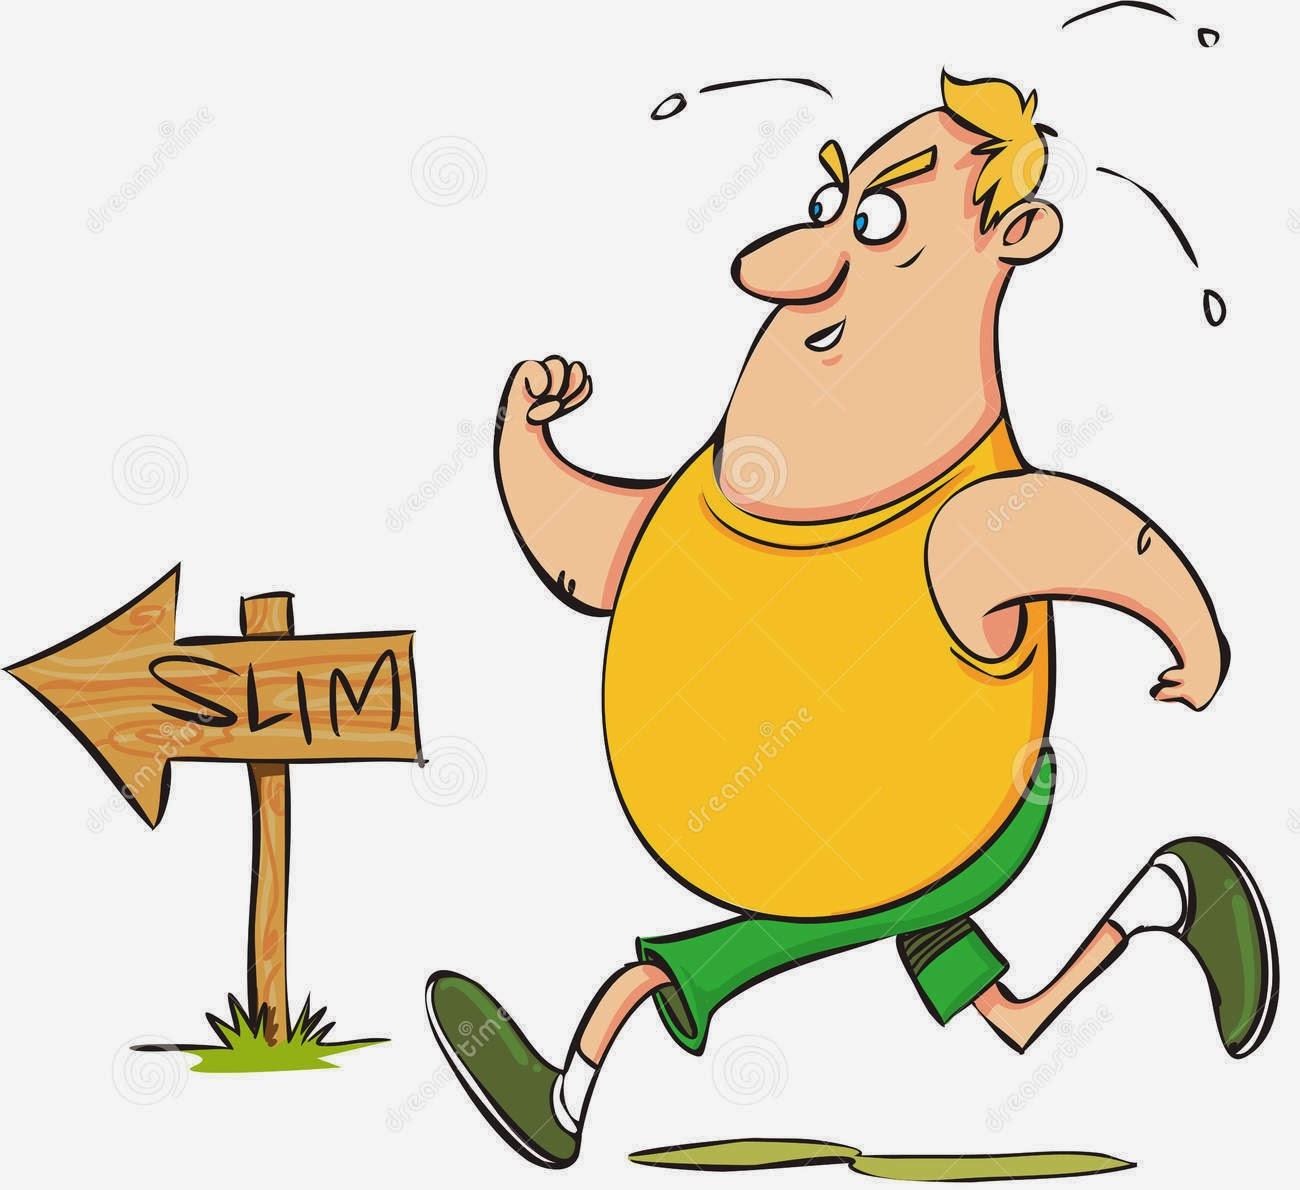 dieta para perdida de grasa extrema